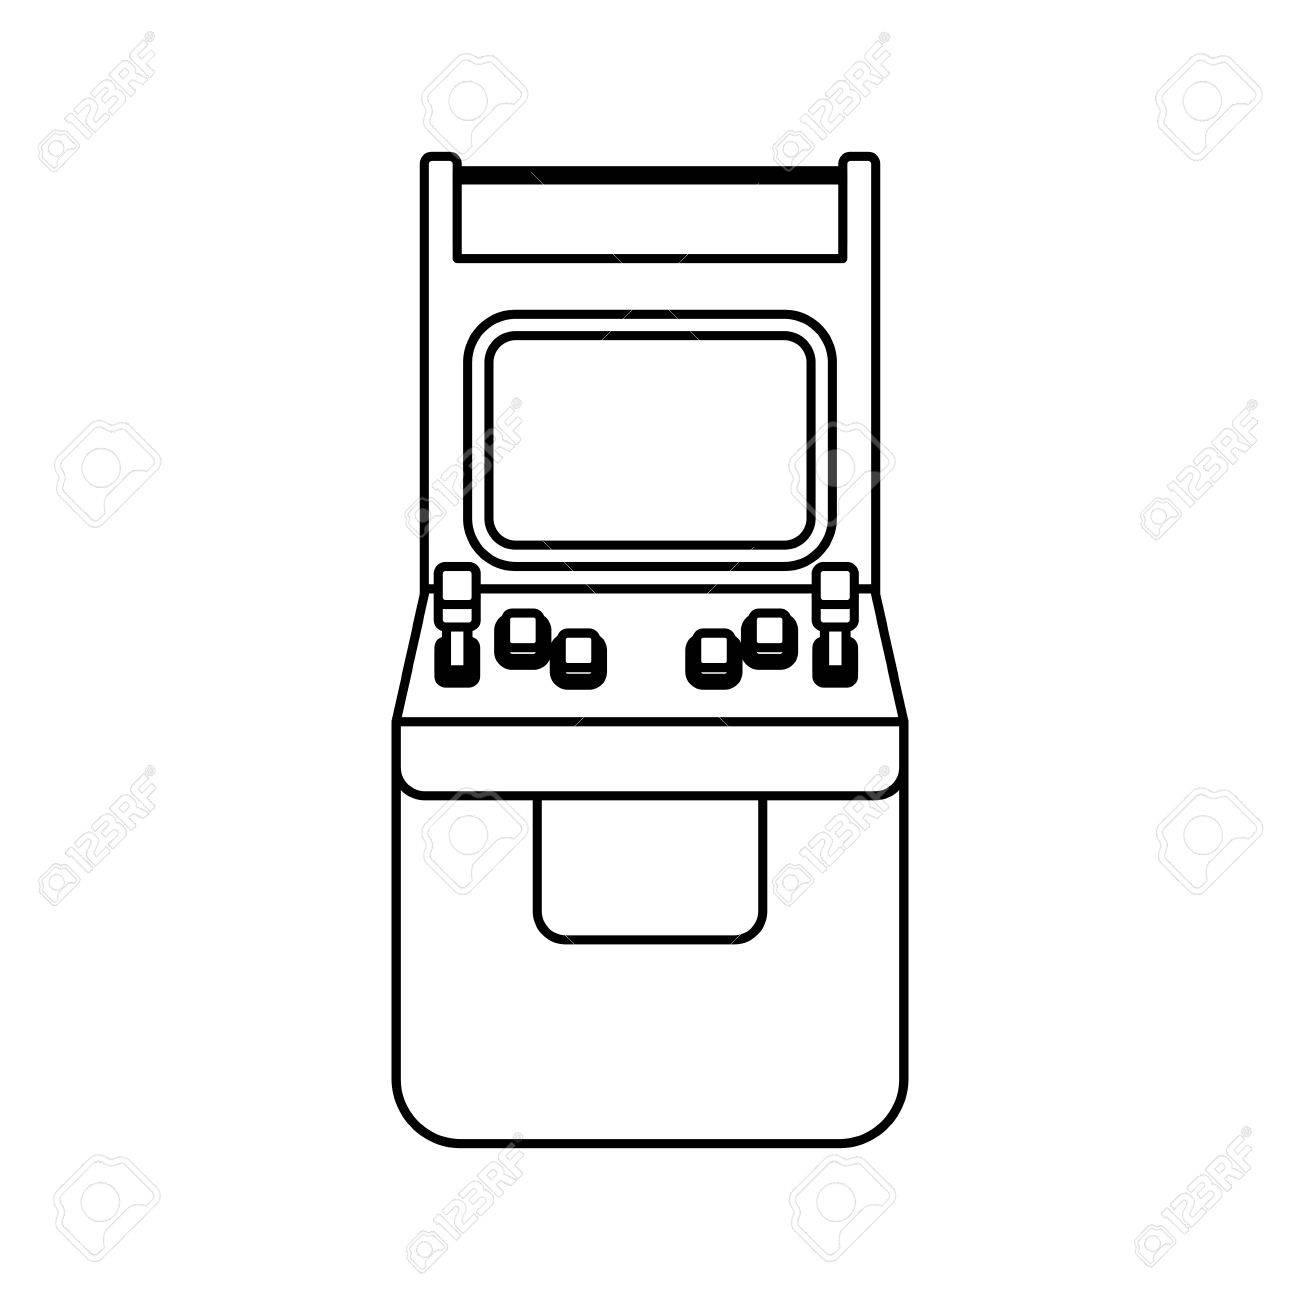 1300x1300 Free Arcade Machine Icon 252988 Download Arcade Machine Icon